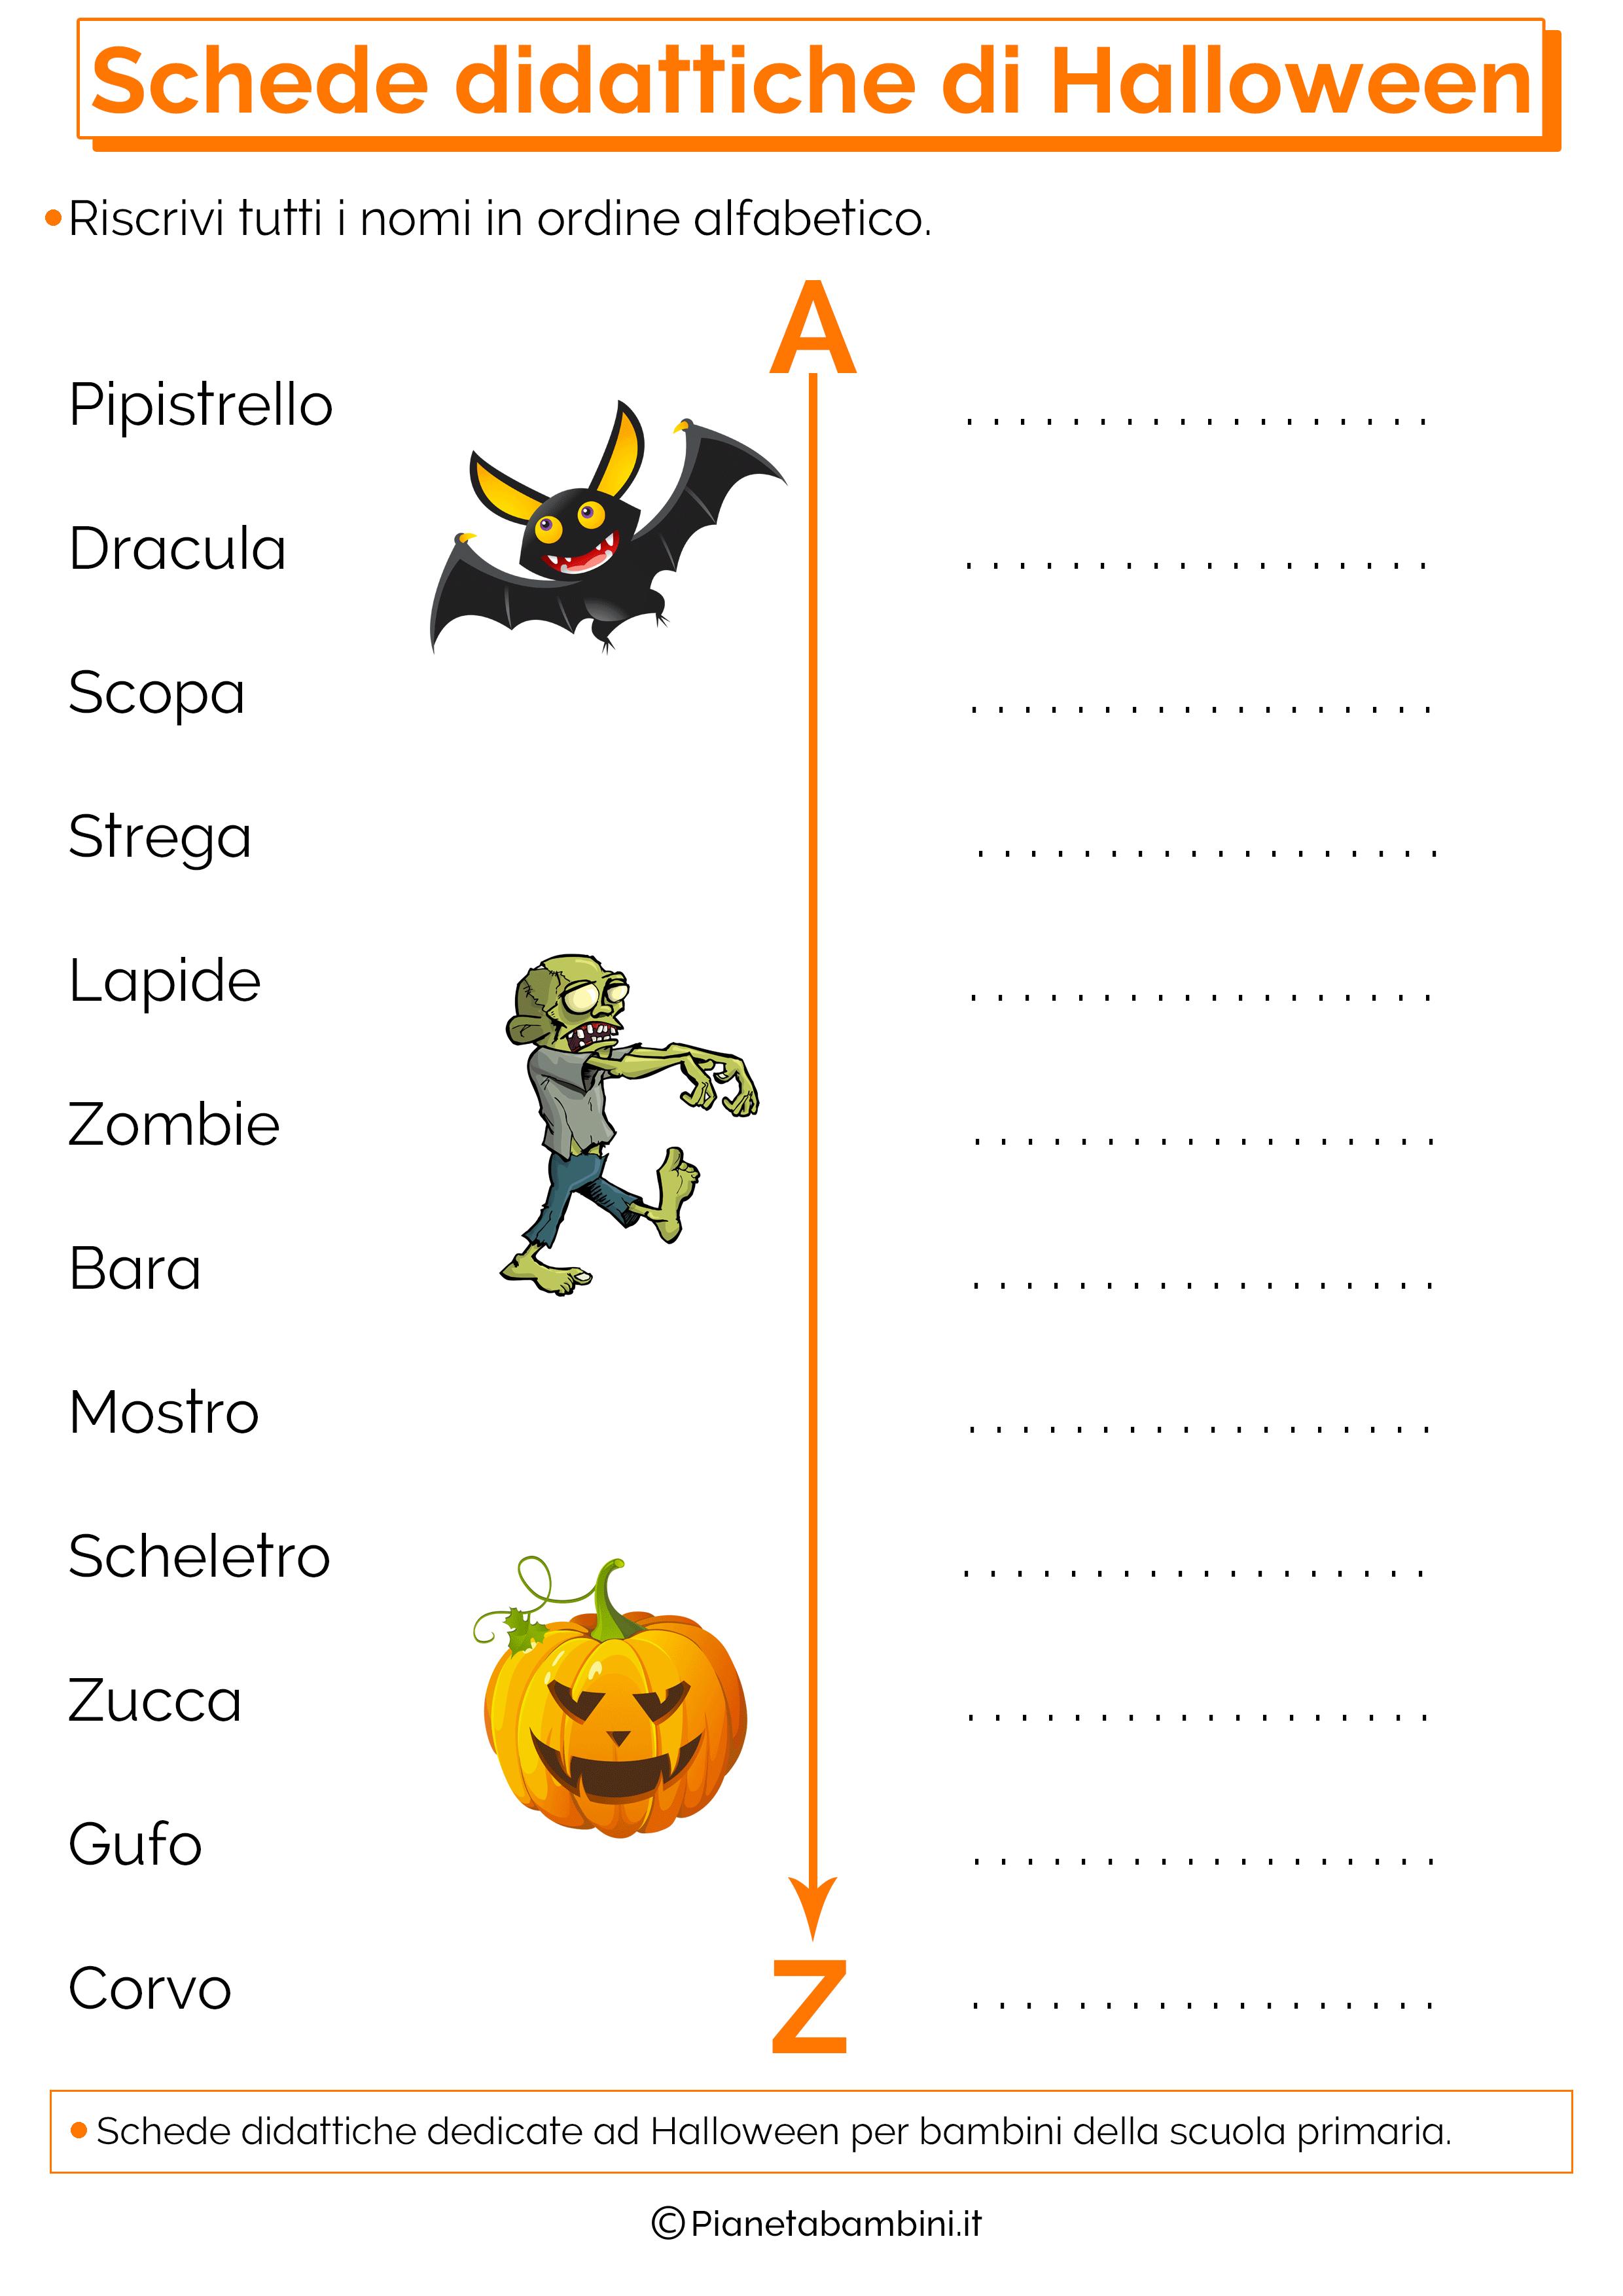 Bien connu Schede Didattiche di Halloween per la Scuola Primaria  VM16